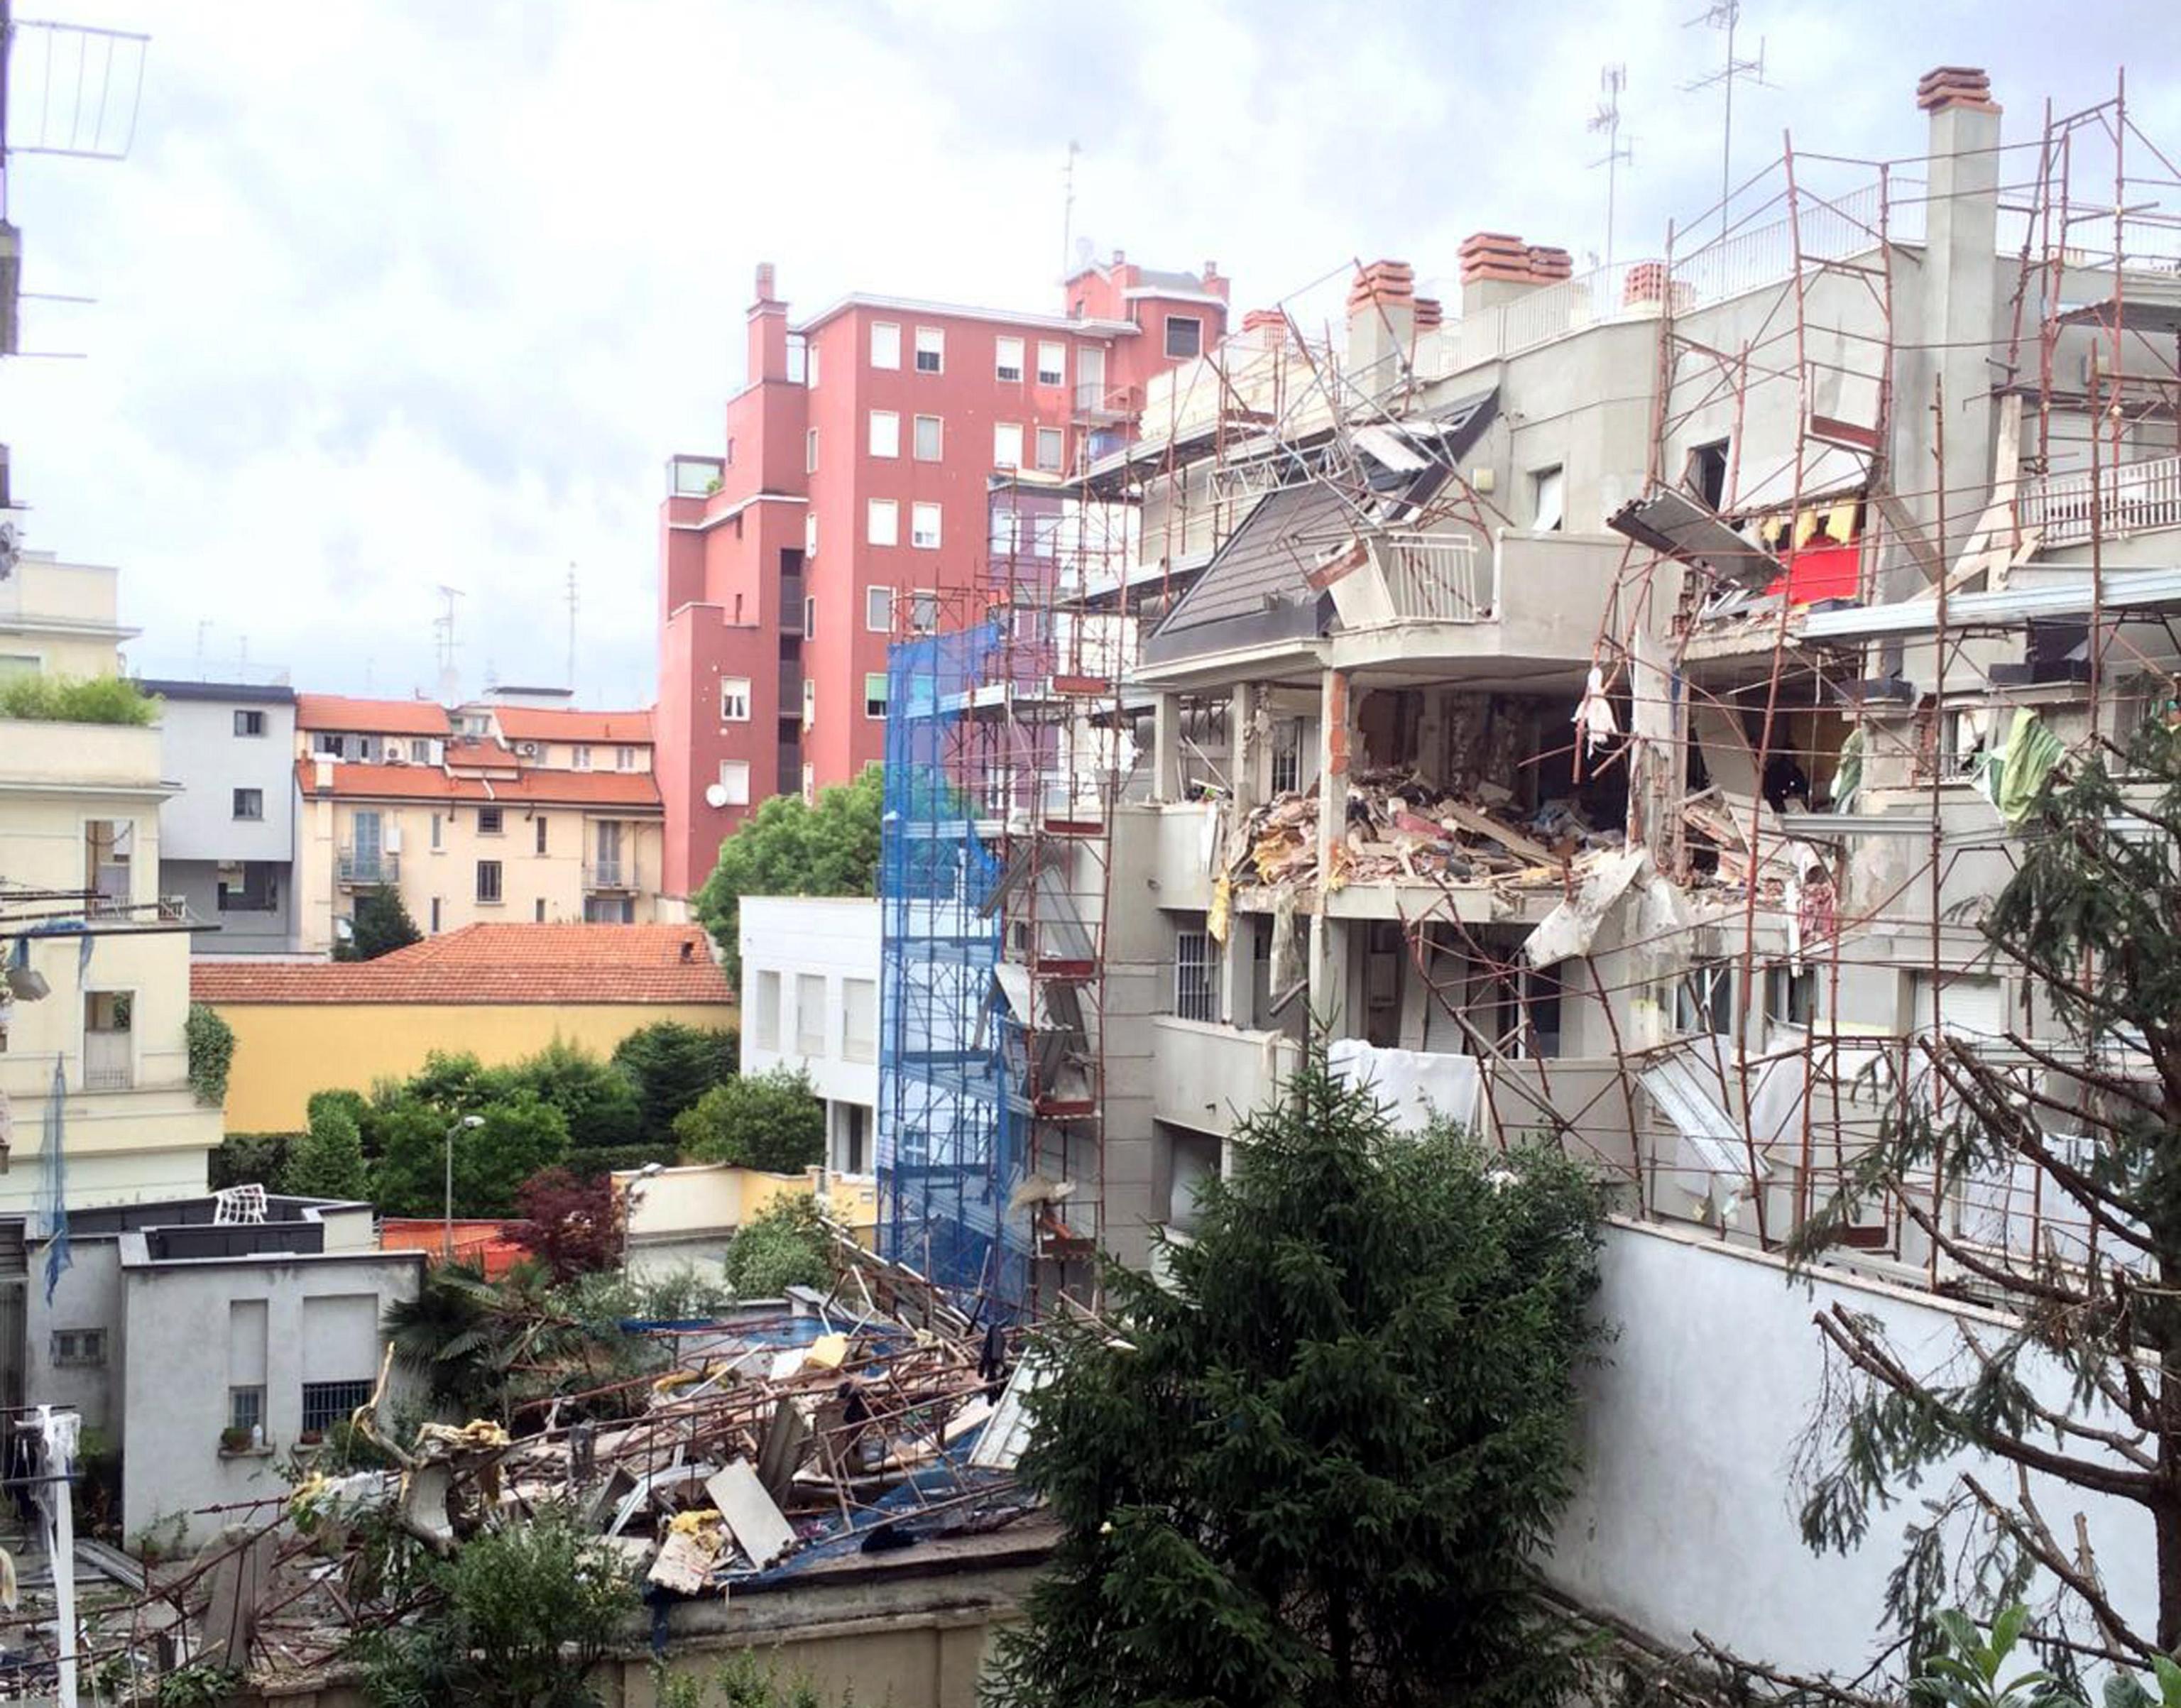 Palazzo esploso a Milano: ergastolo per Giuseppe Pellicanò